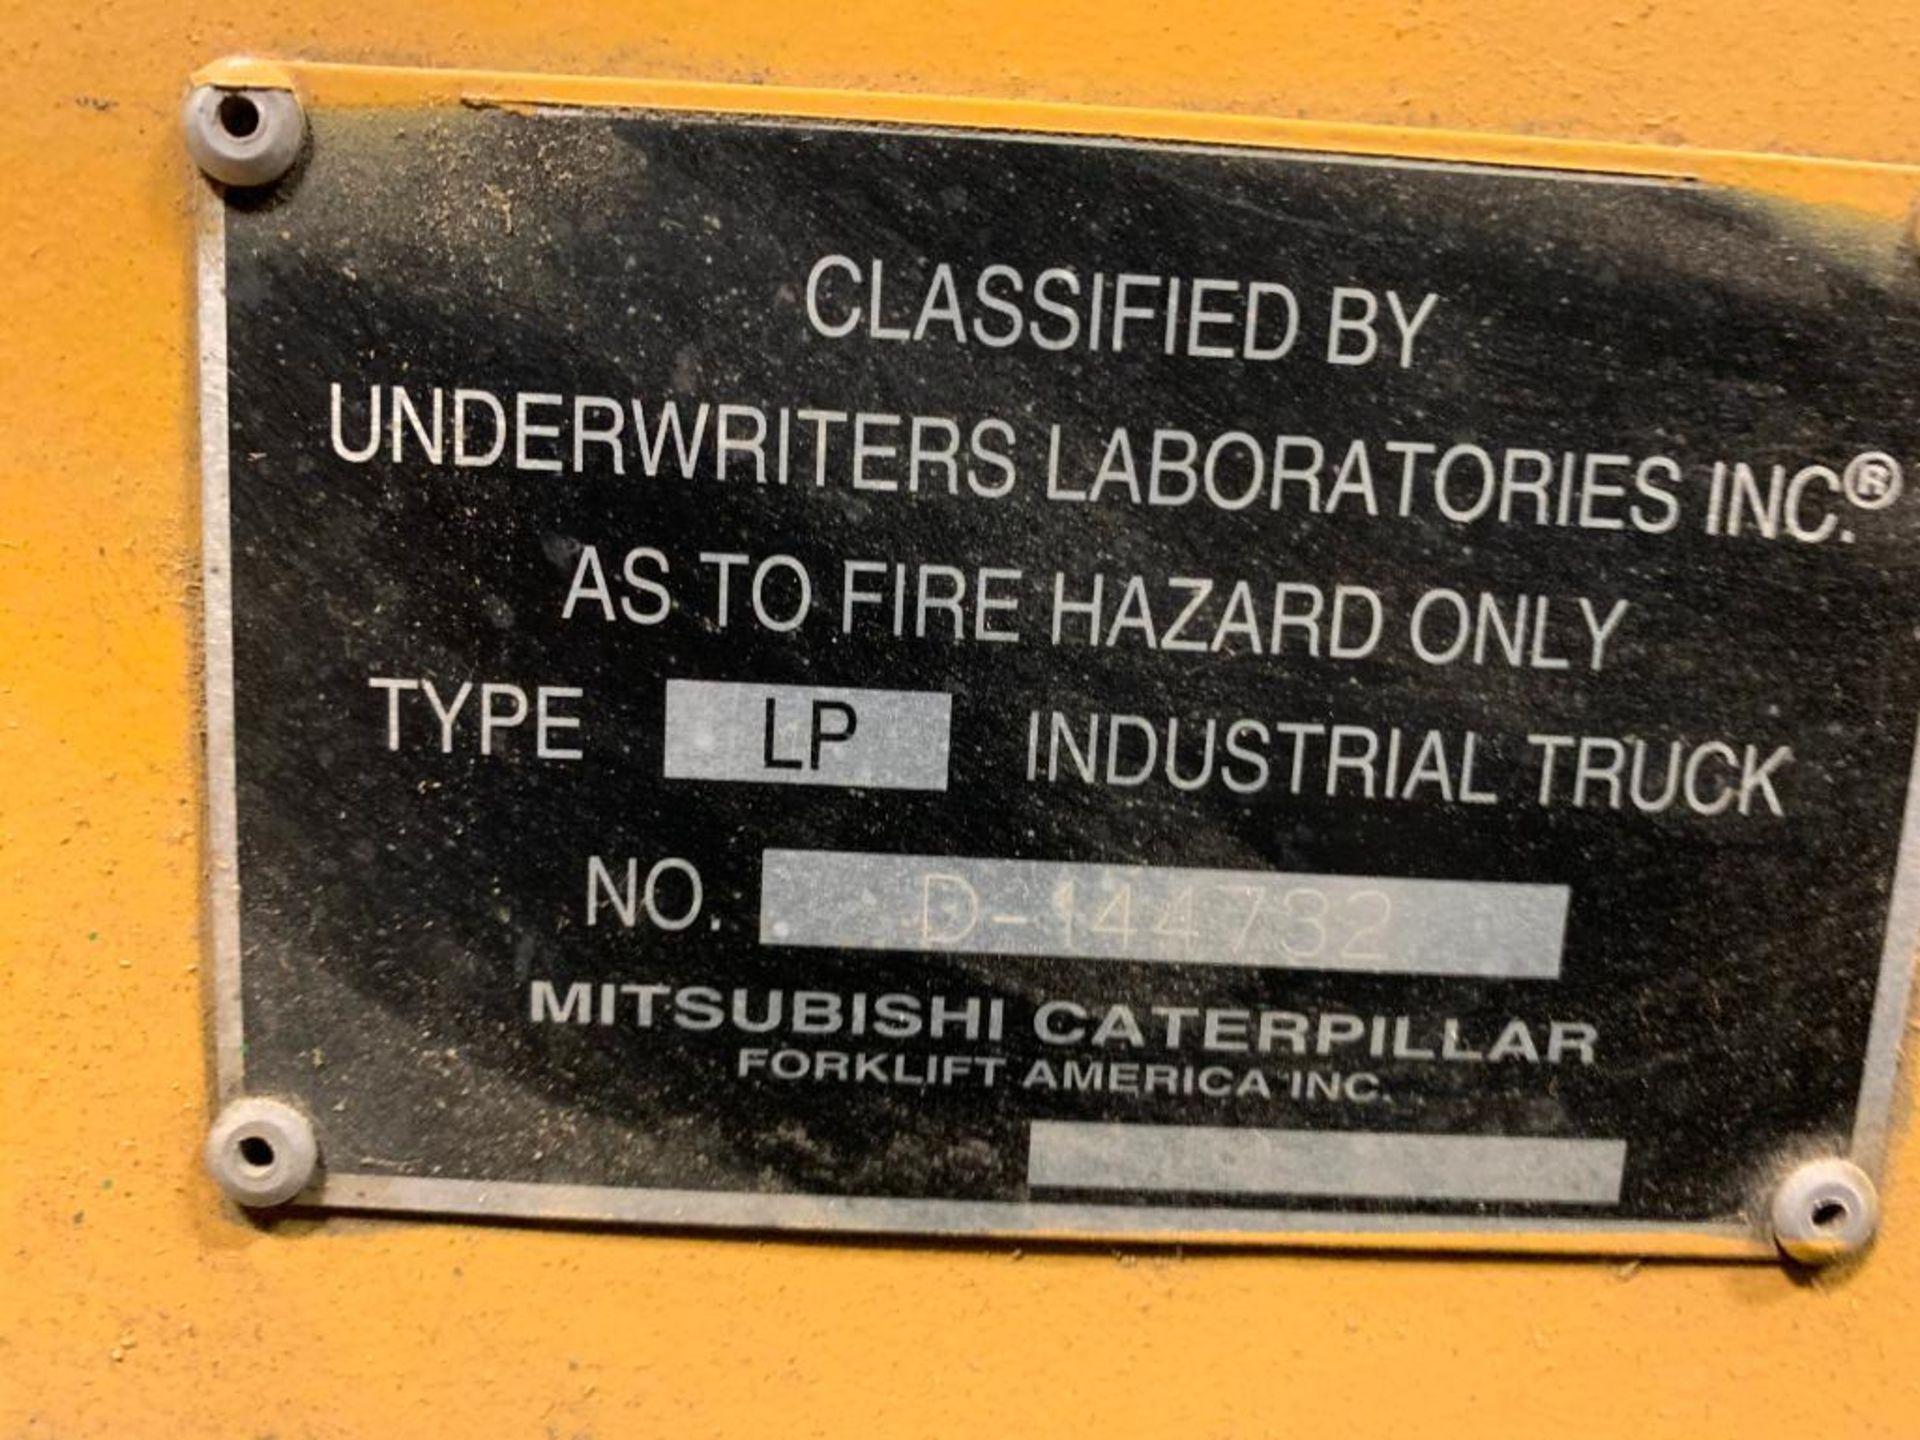 Catepillar fork truck, LP gas - Image 4 of 13